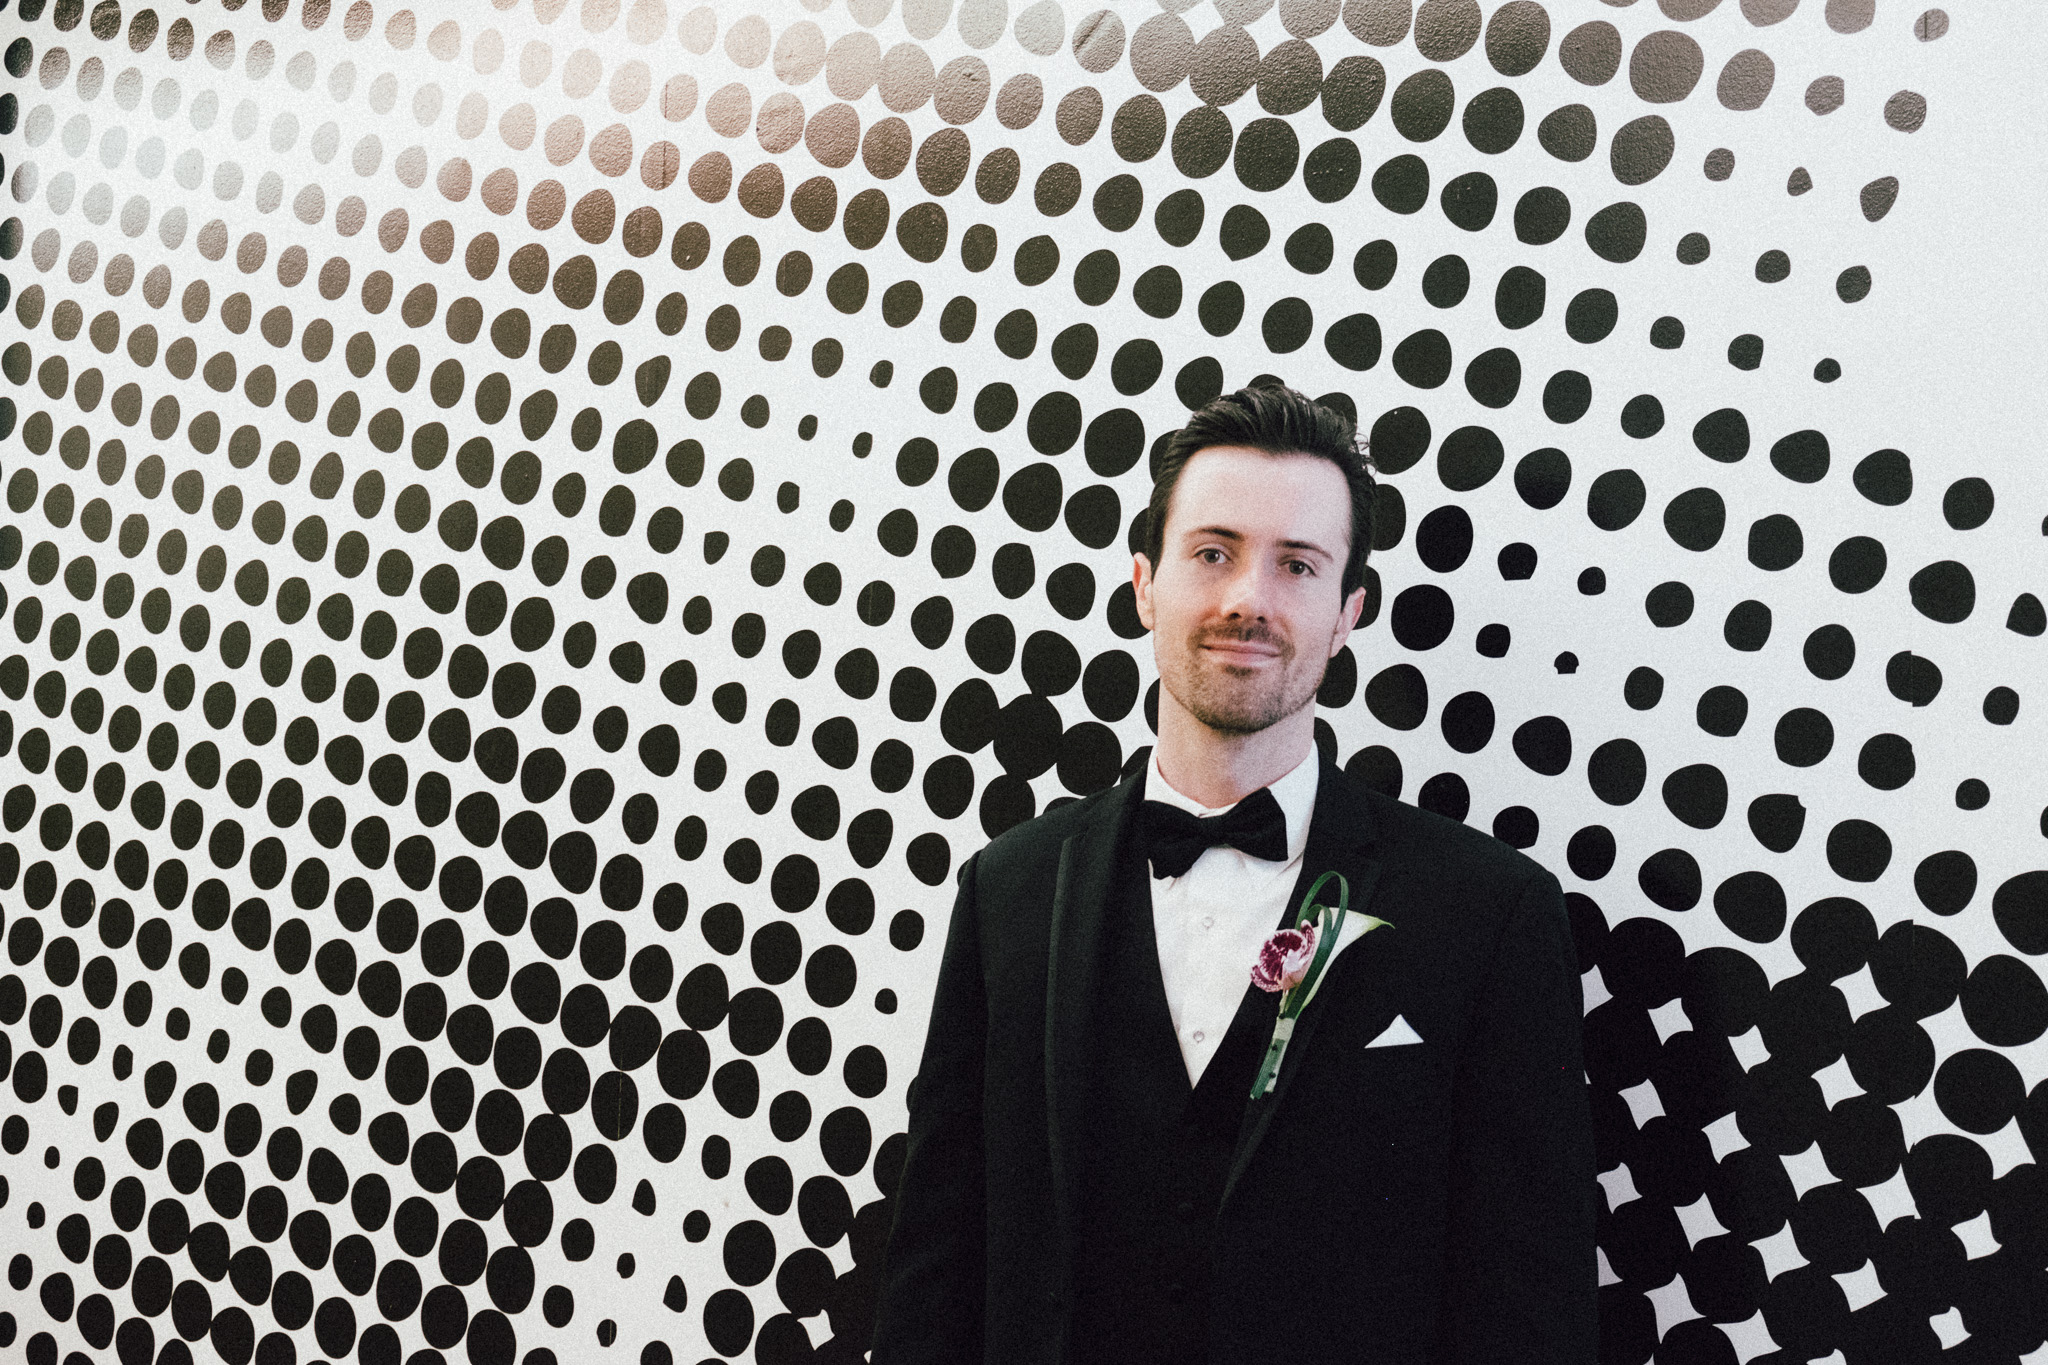 Brooke-Kyle-Indianapolis-Wedding-Blog-49.jpg